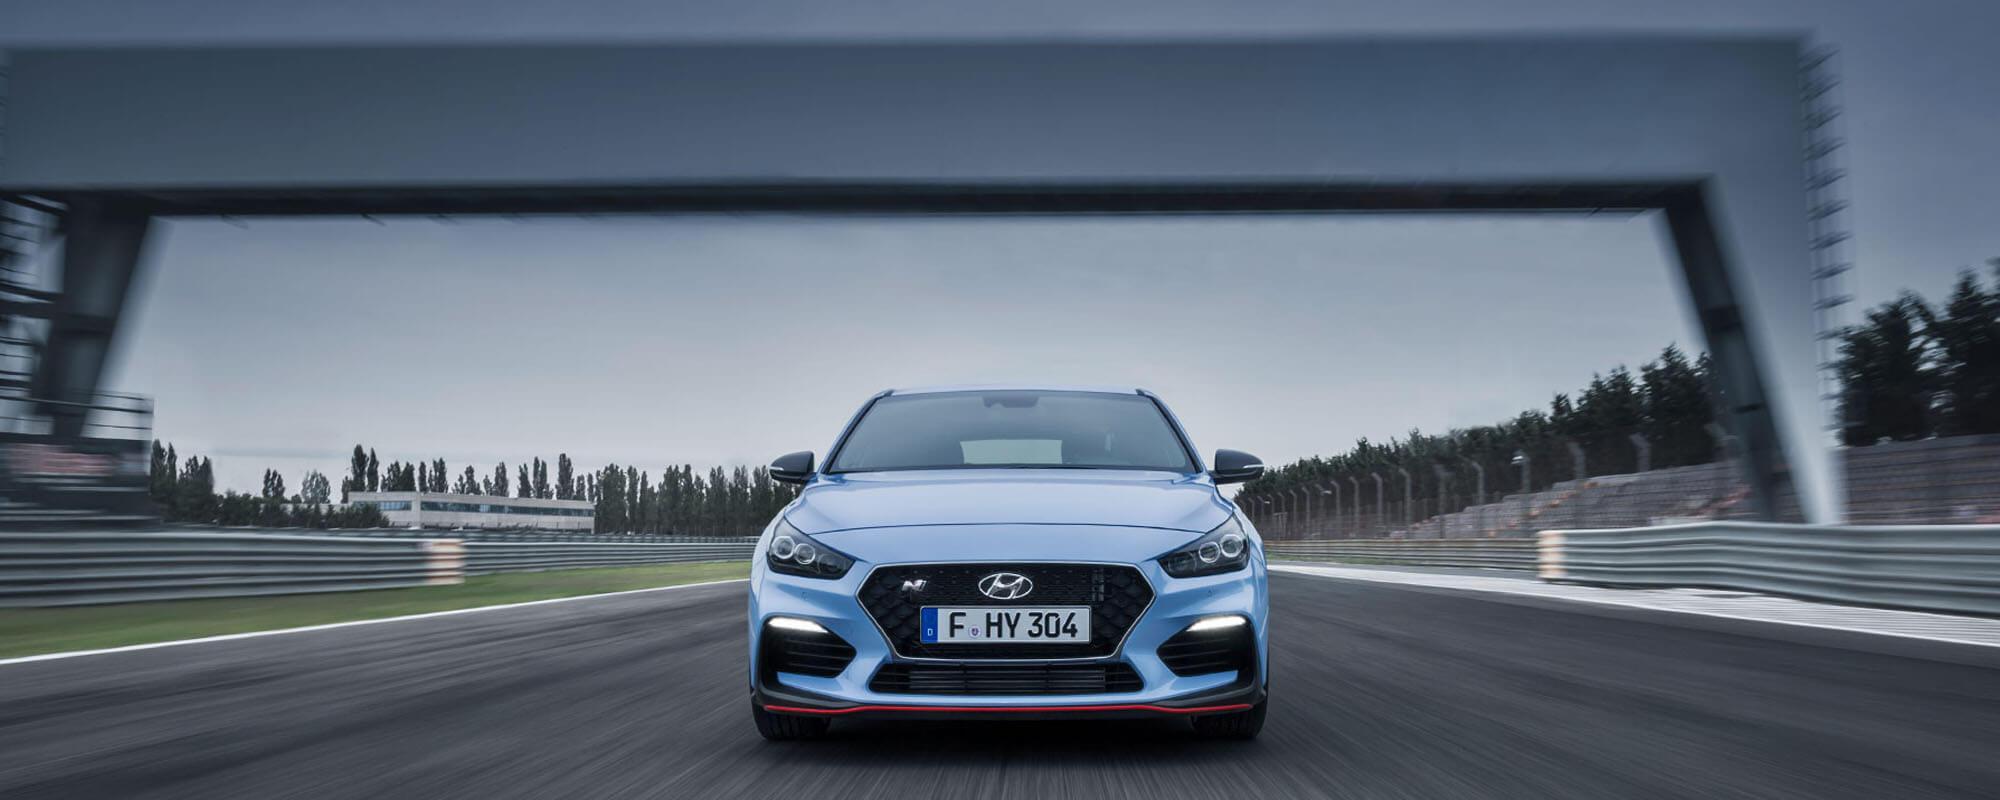 New hyundai i30 n coming soon to rockhampton dc motors for Hyundai motor finance contact